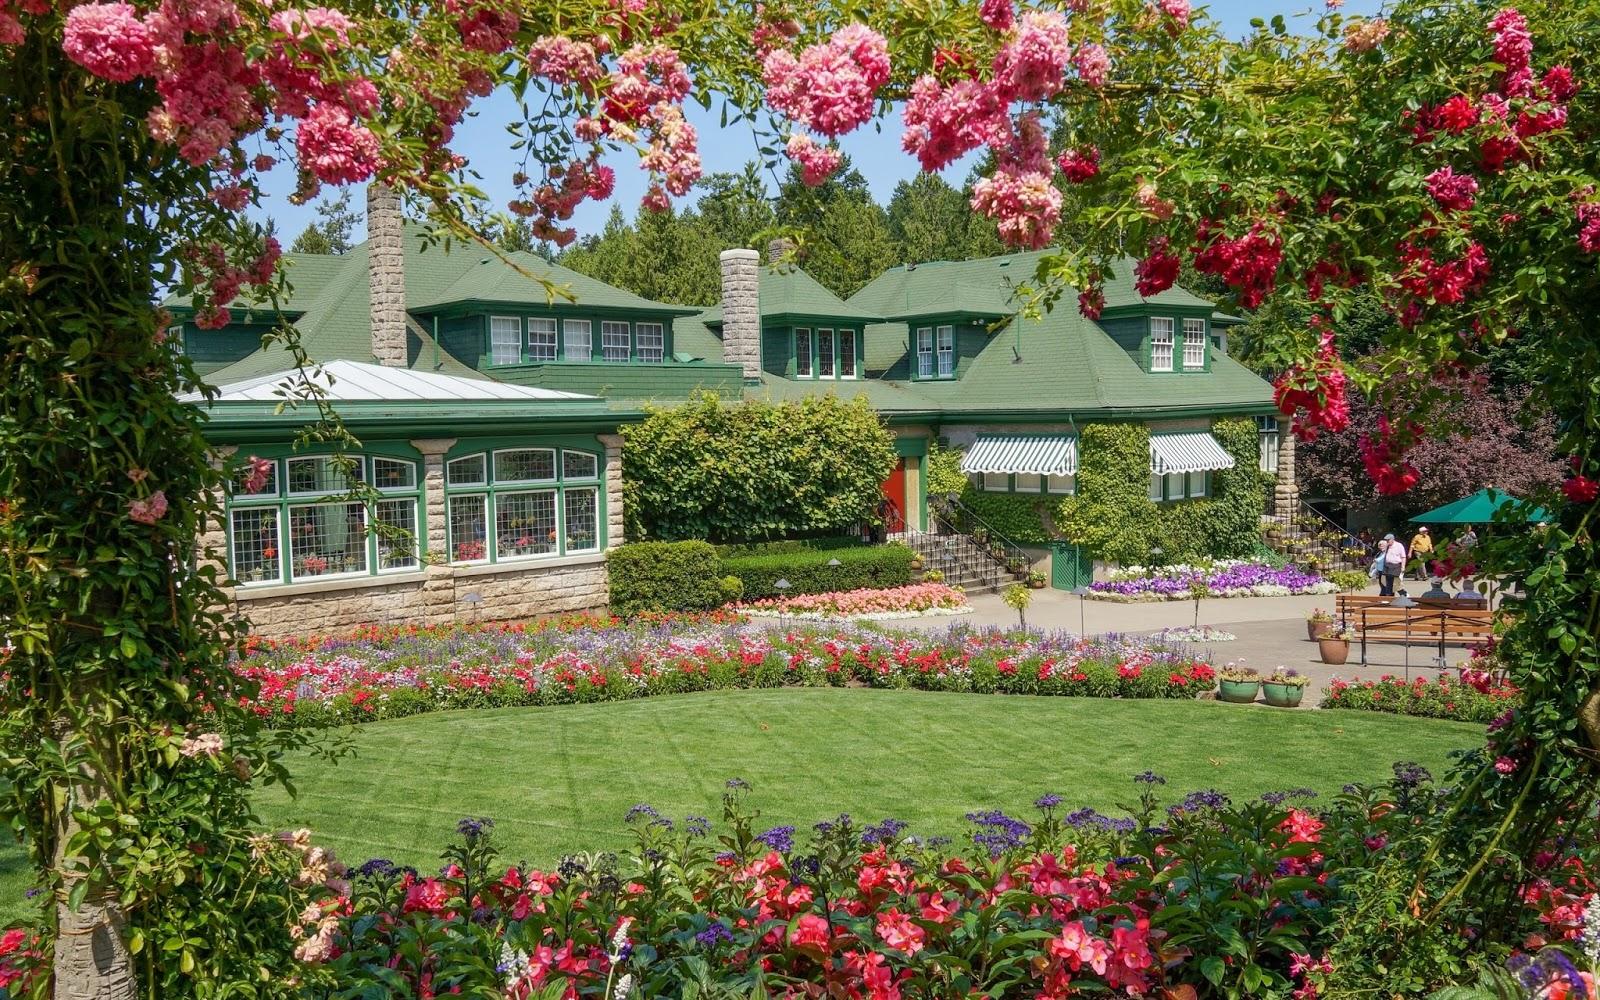 flores jardins fotos : flores jardins fotos:Flores Jardines Butchart